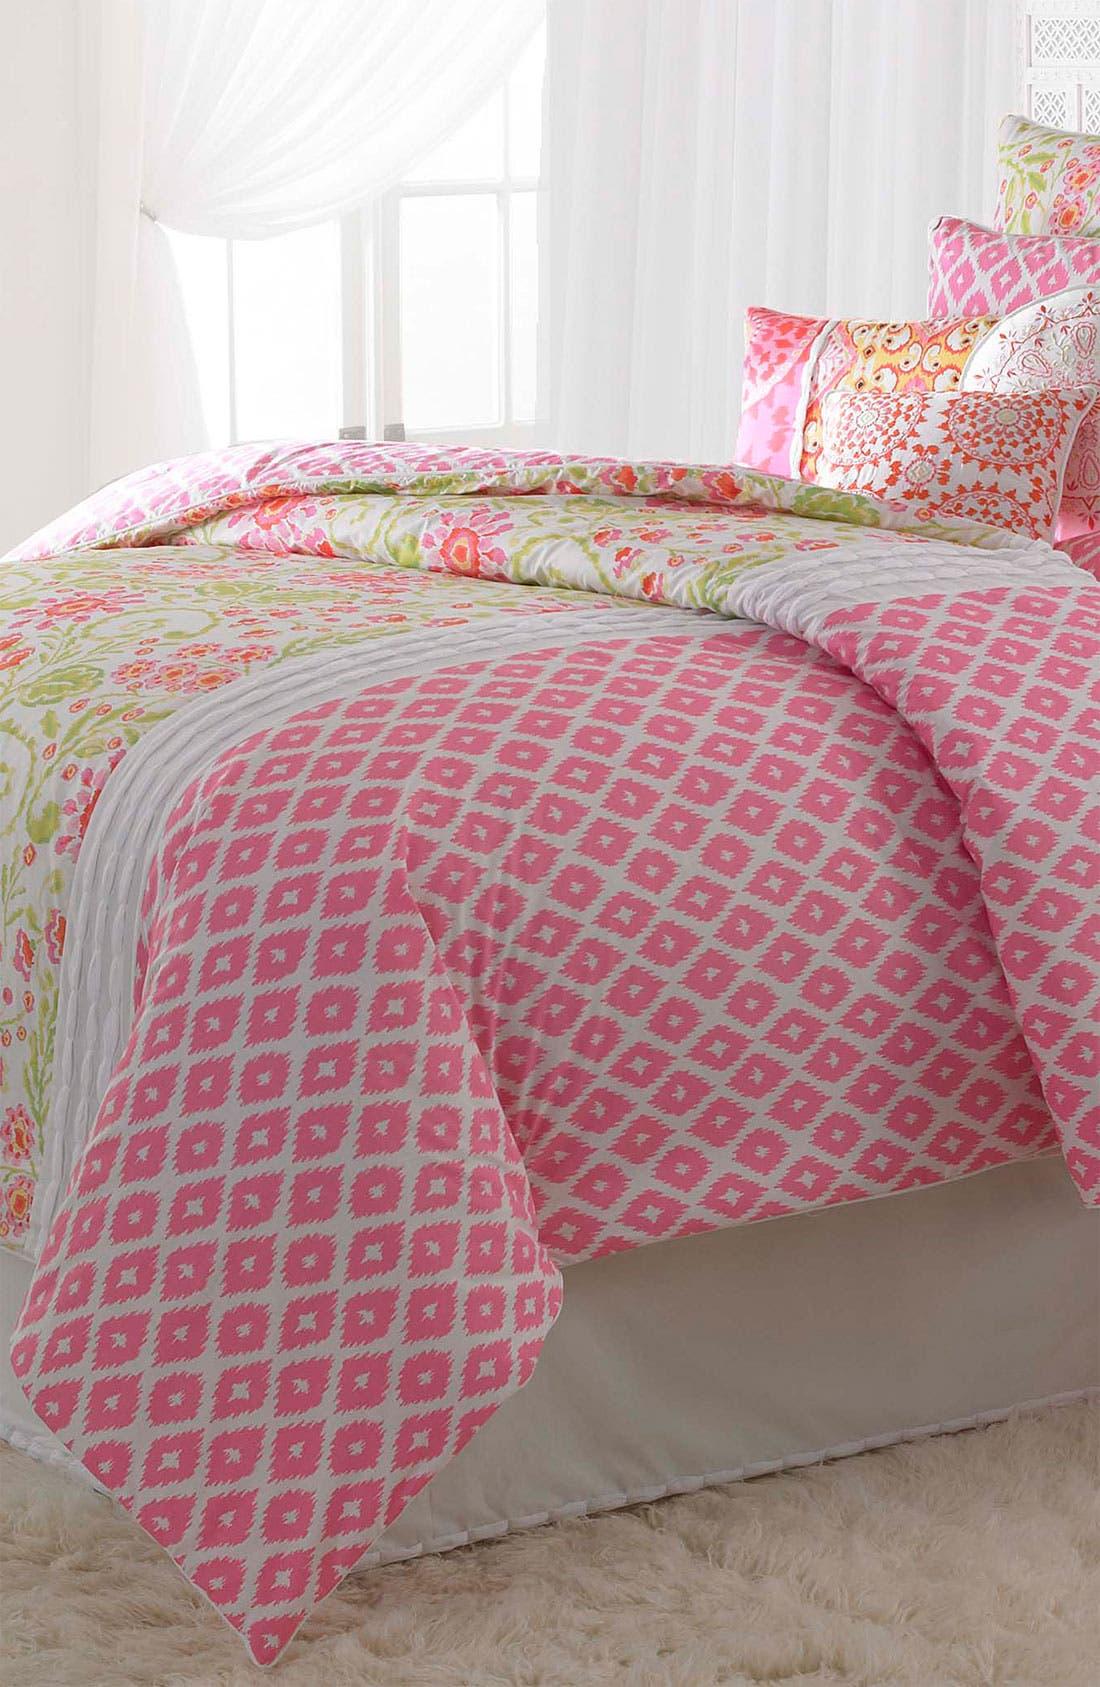 Main Image - Dena Home 'Ikat Blossom' Comforter